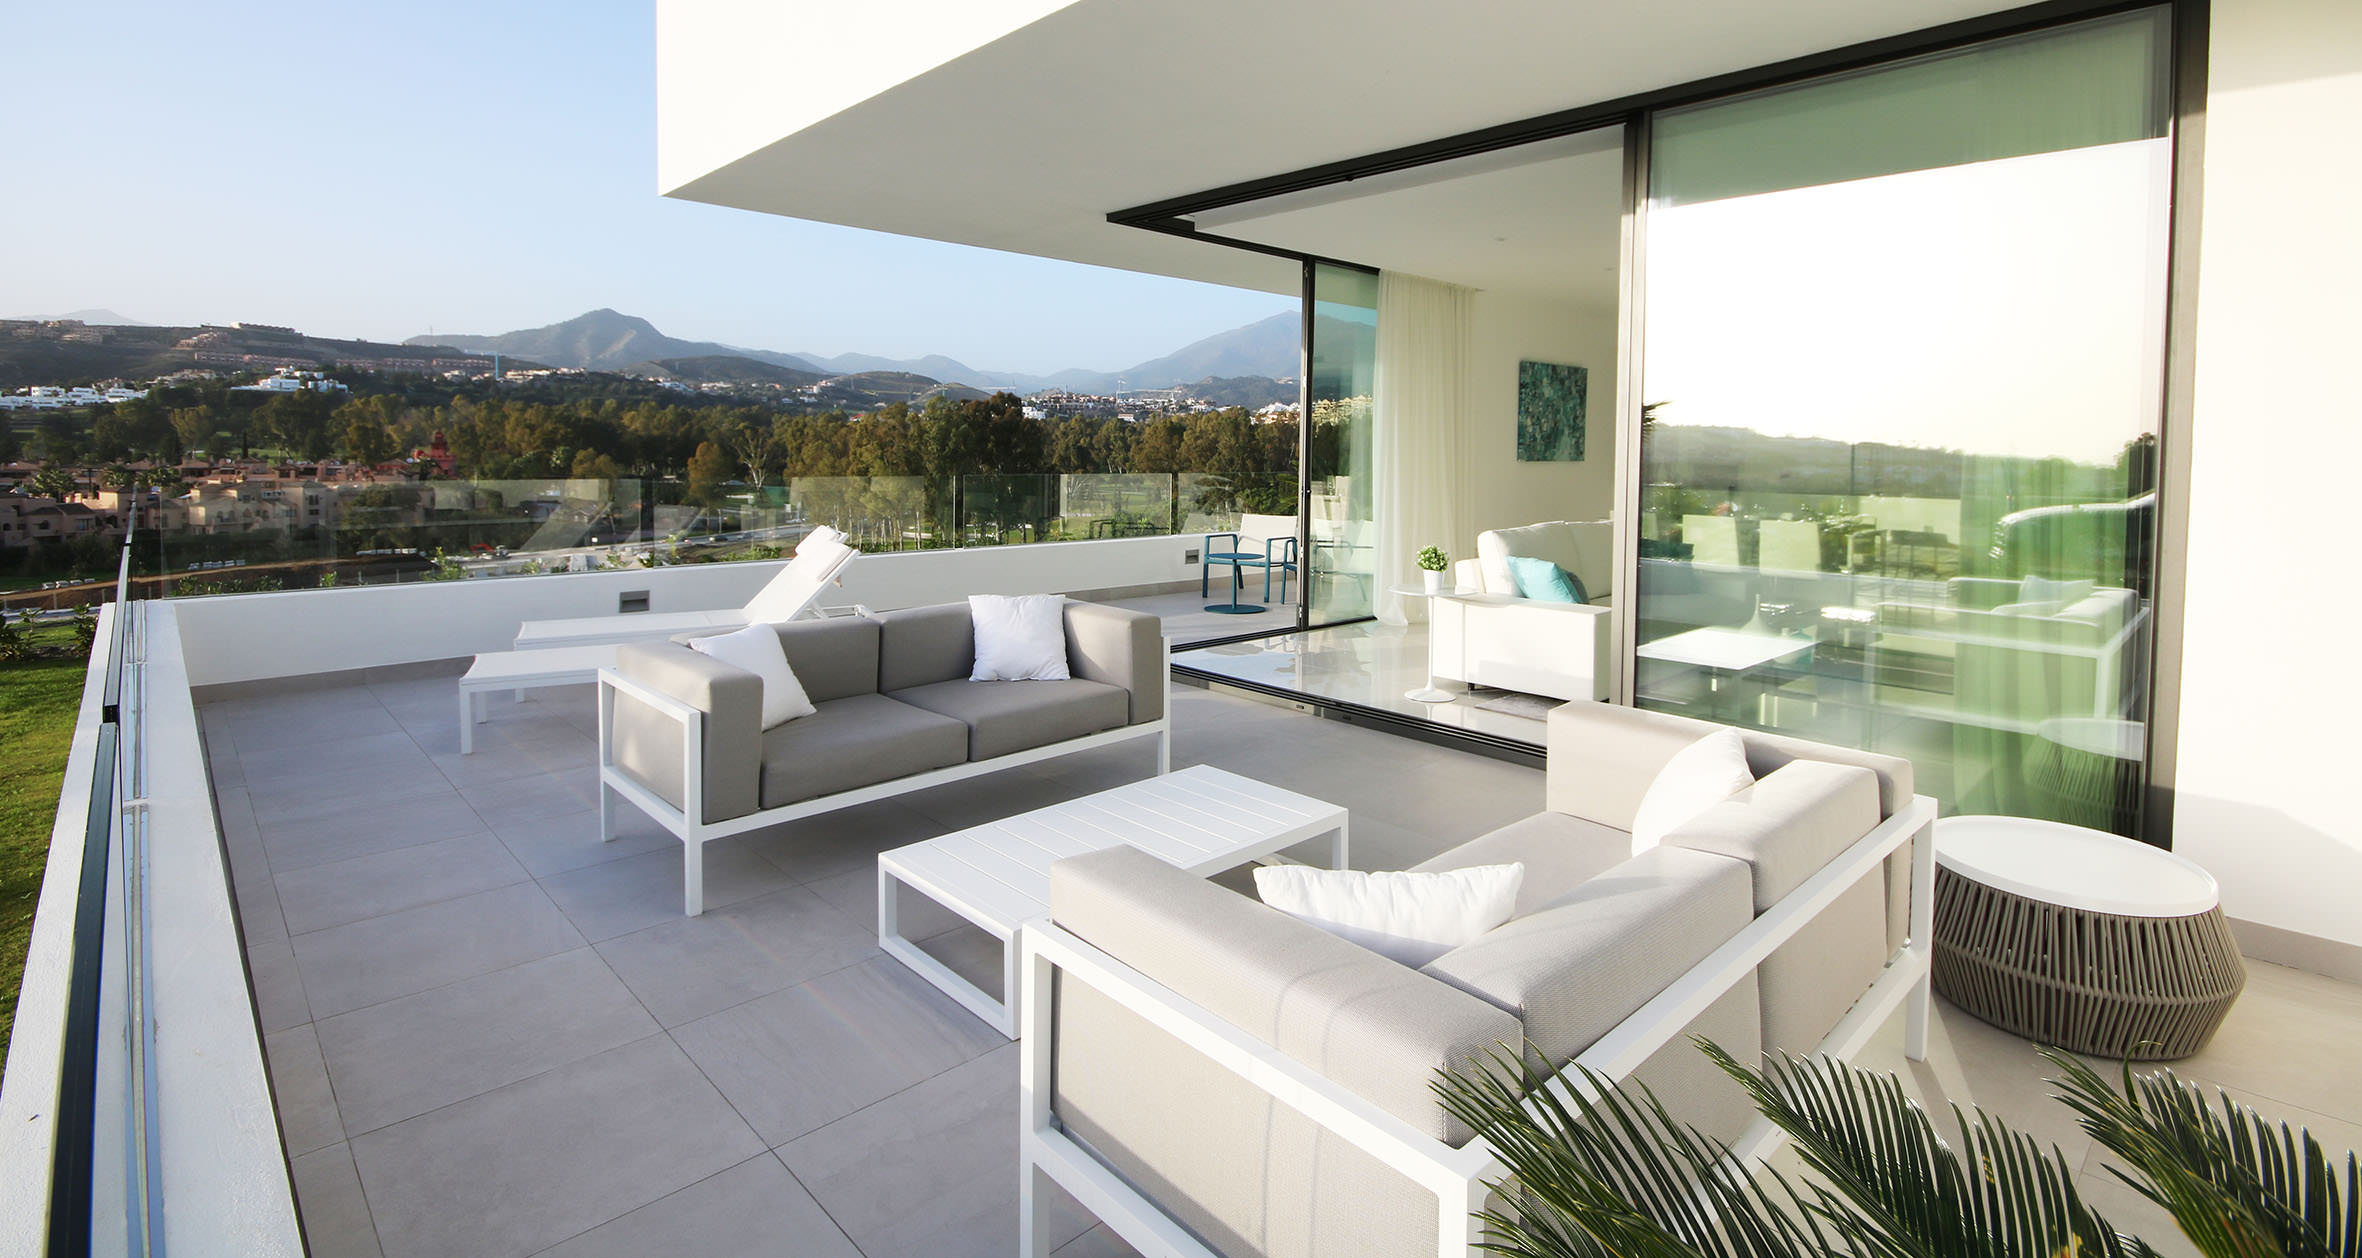 Cataleya off plan apartments for sale Estepona_Terrace I_Realista Quality Properties Marbella